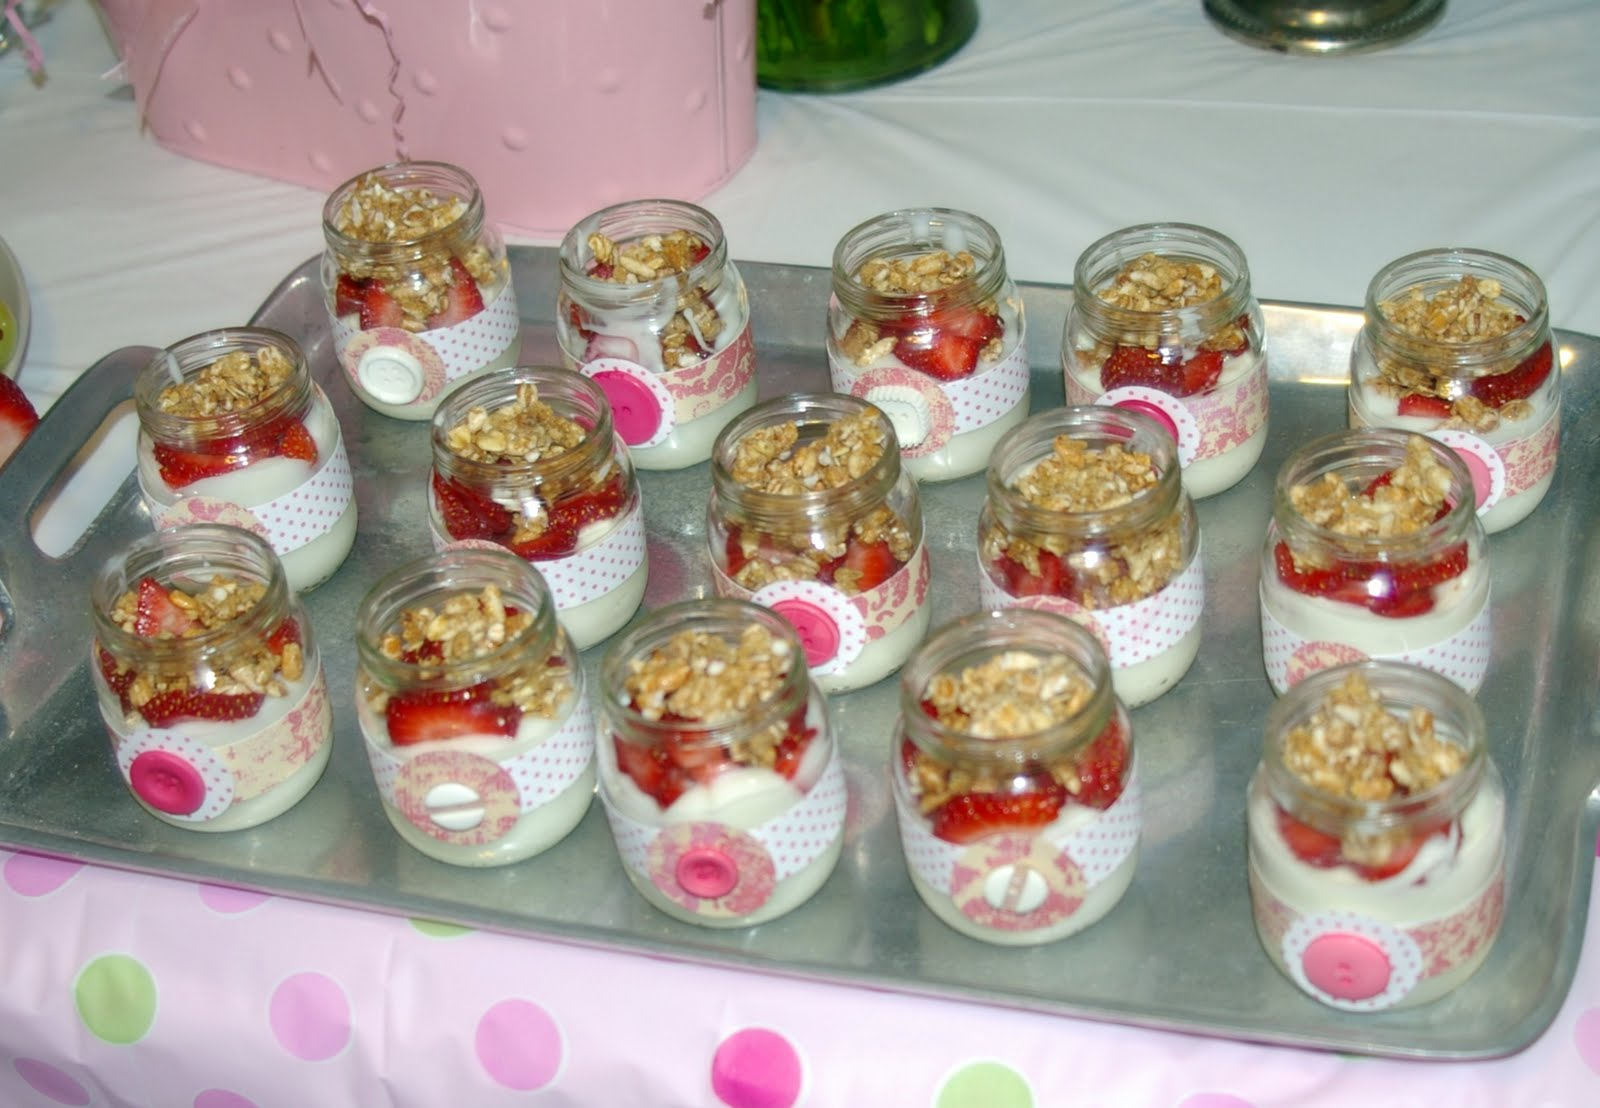 Baby Shower Food Ideas: Cute Food Ideas For A Boy Baby Shower